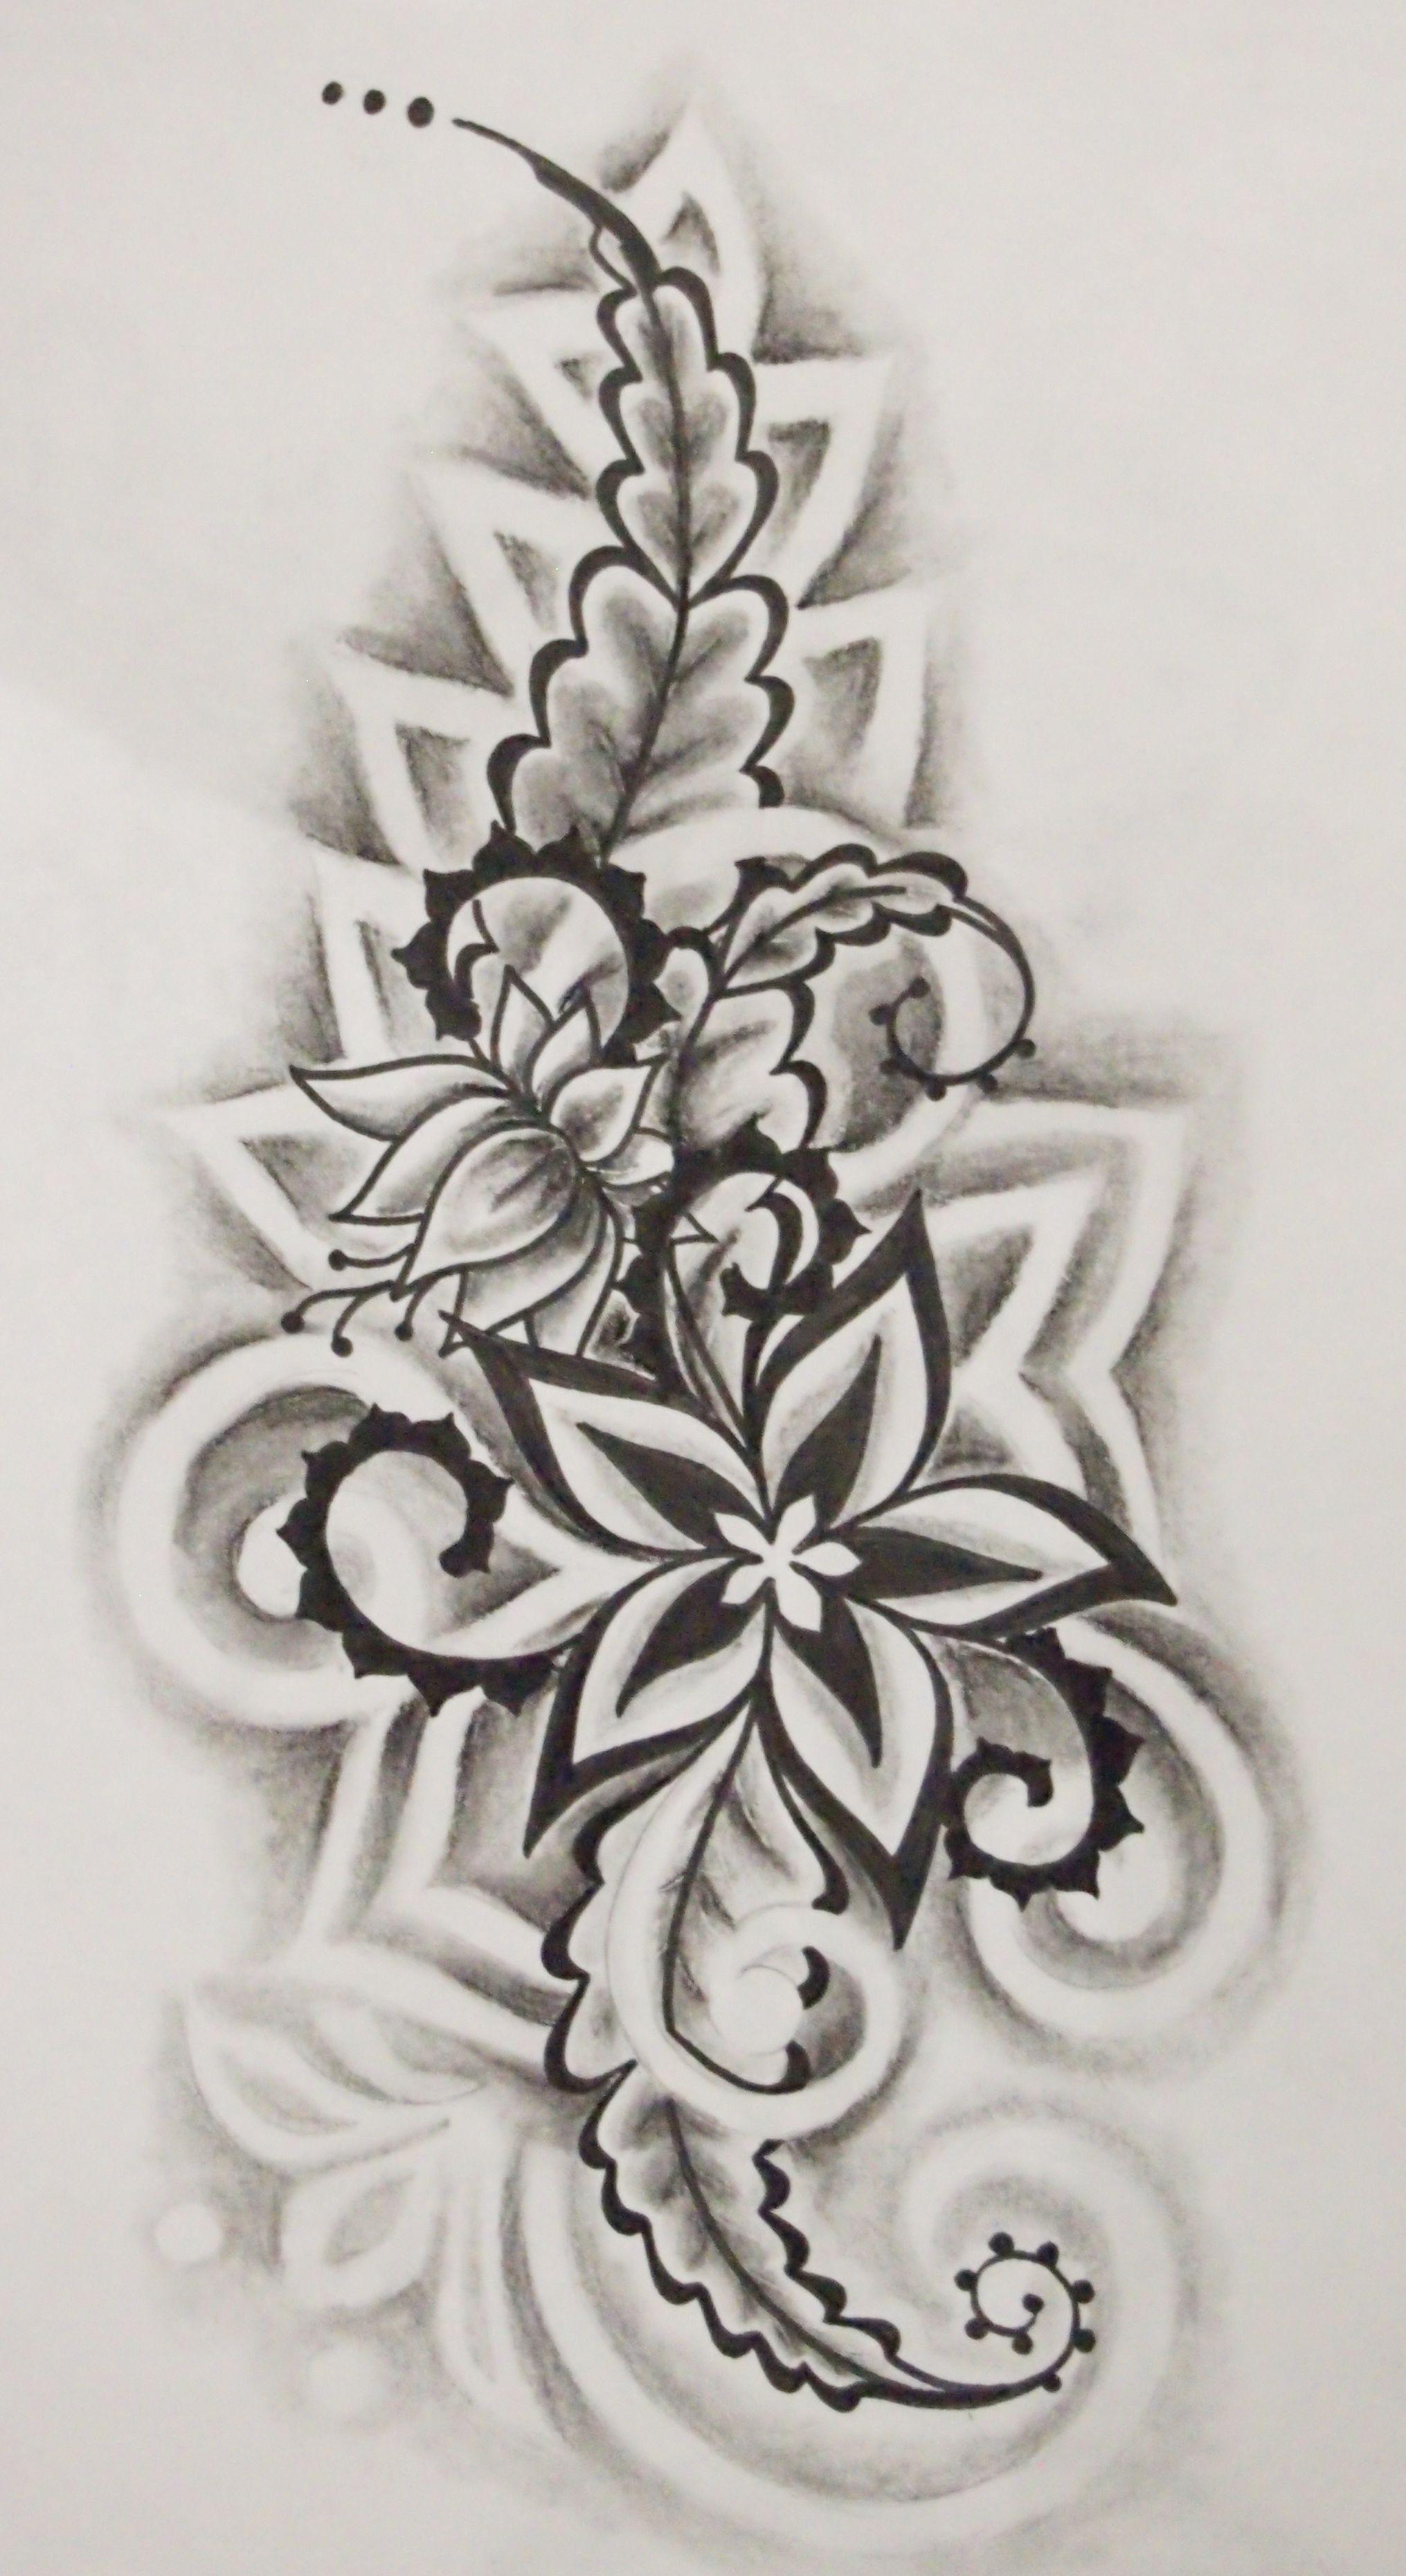 Dessiner tattoo recherche google fleur a dessiner - Fleurs a dessiner modele ...